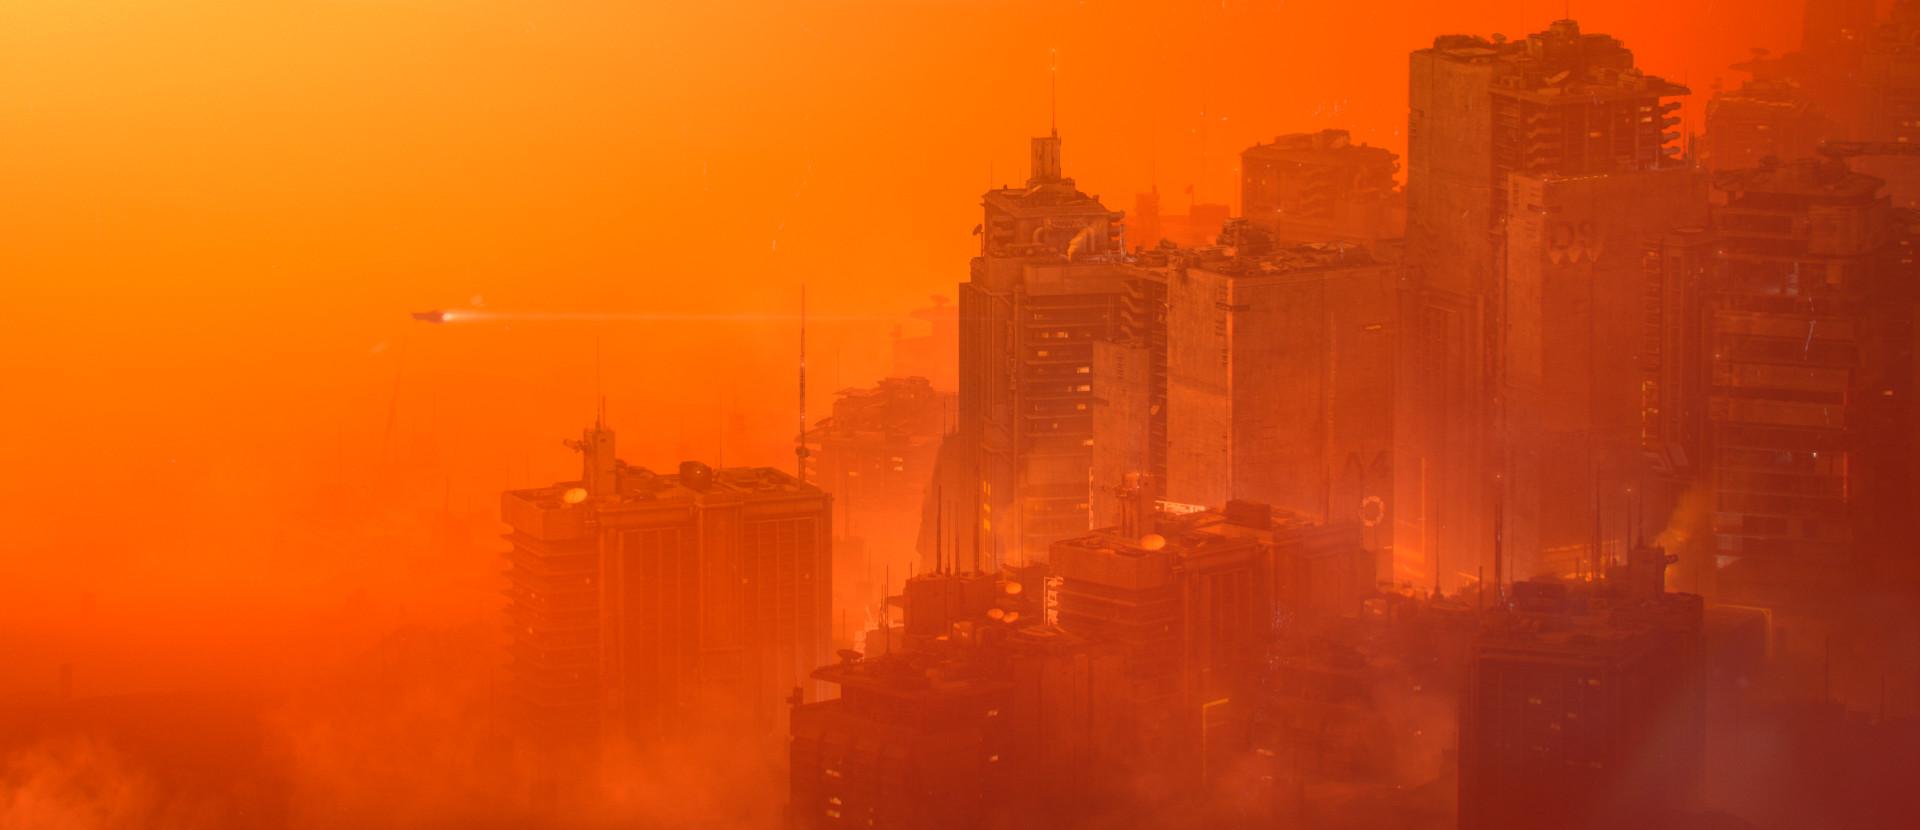 victor-dufayard-sandstorm.jpg?1527729961